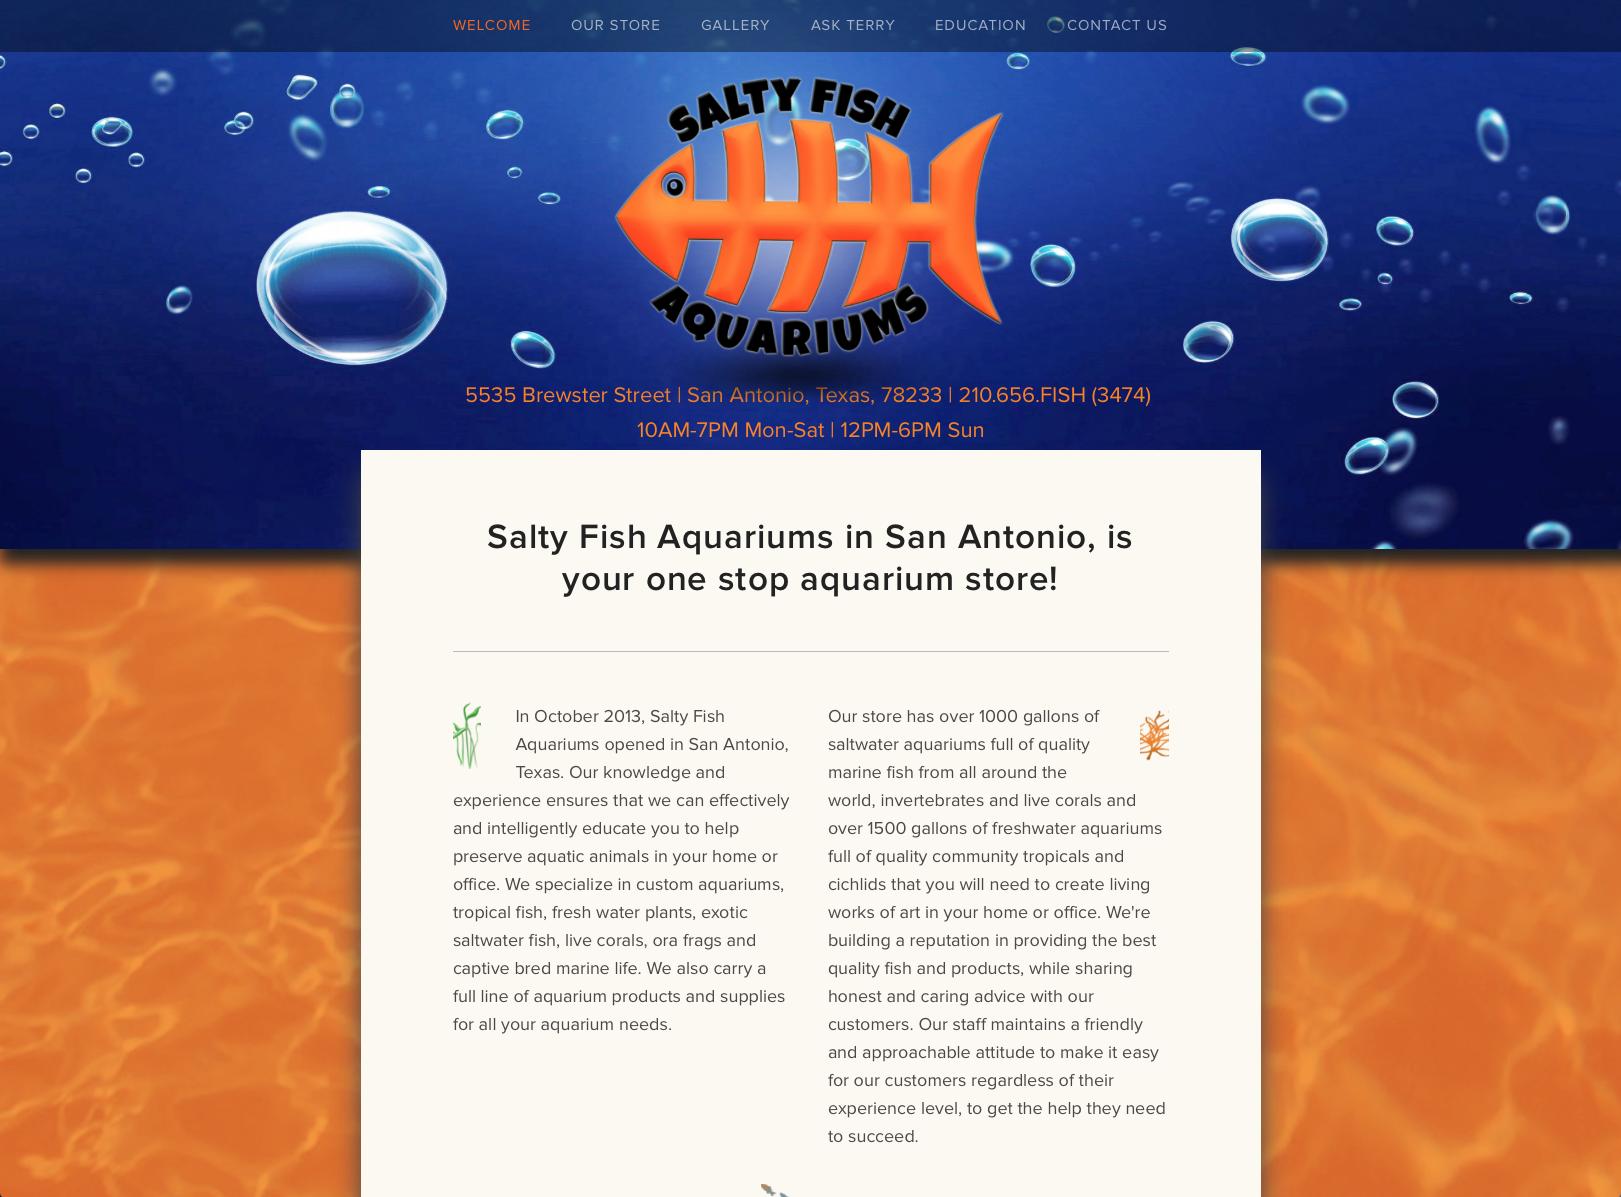 Salty Fish Aquariums